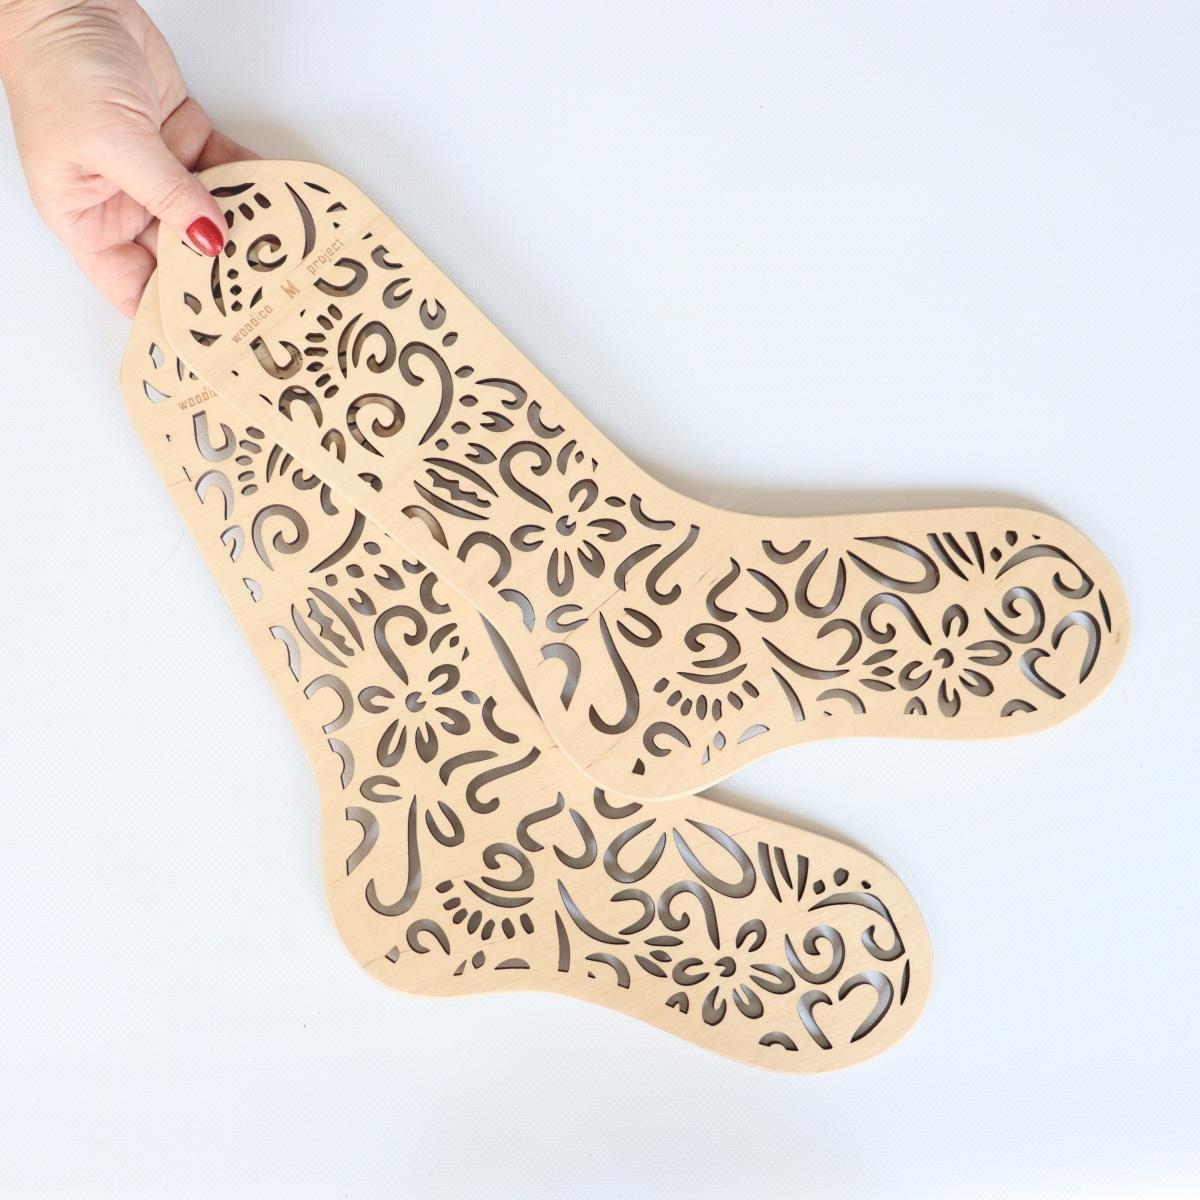 woodico.pro wooden sock blockers seeds 7 1200x1200 - Wooden sock blockers / Seeds